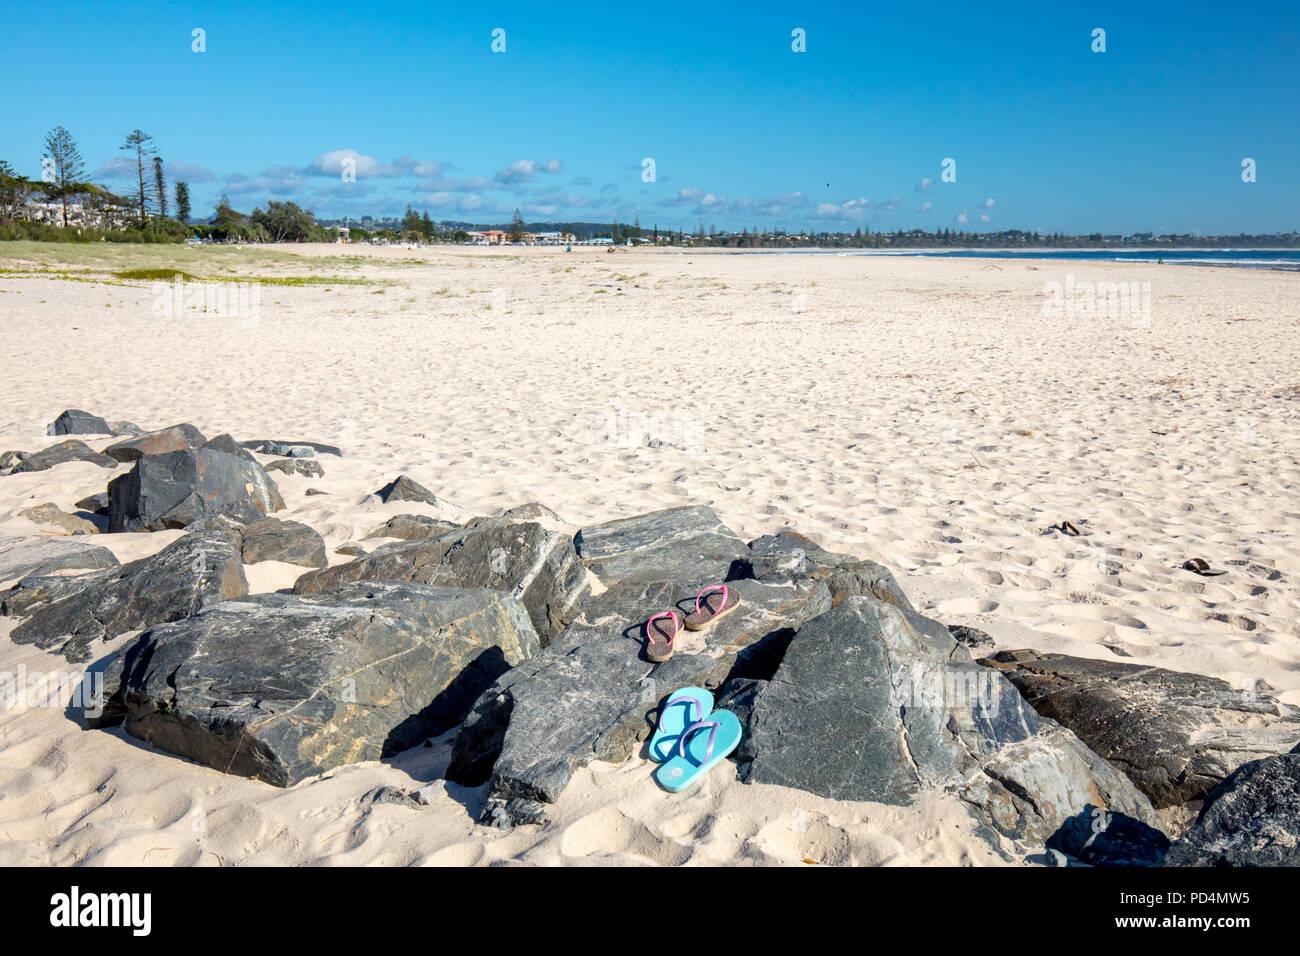 Kingscliff Beach Australia - Stock Image